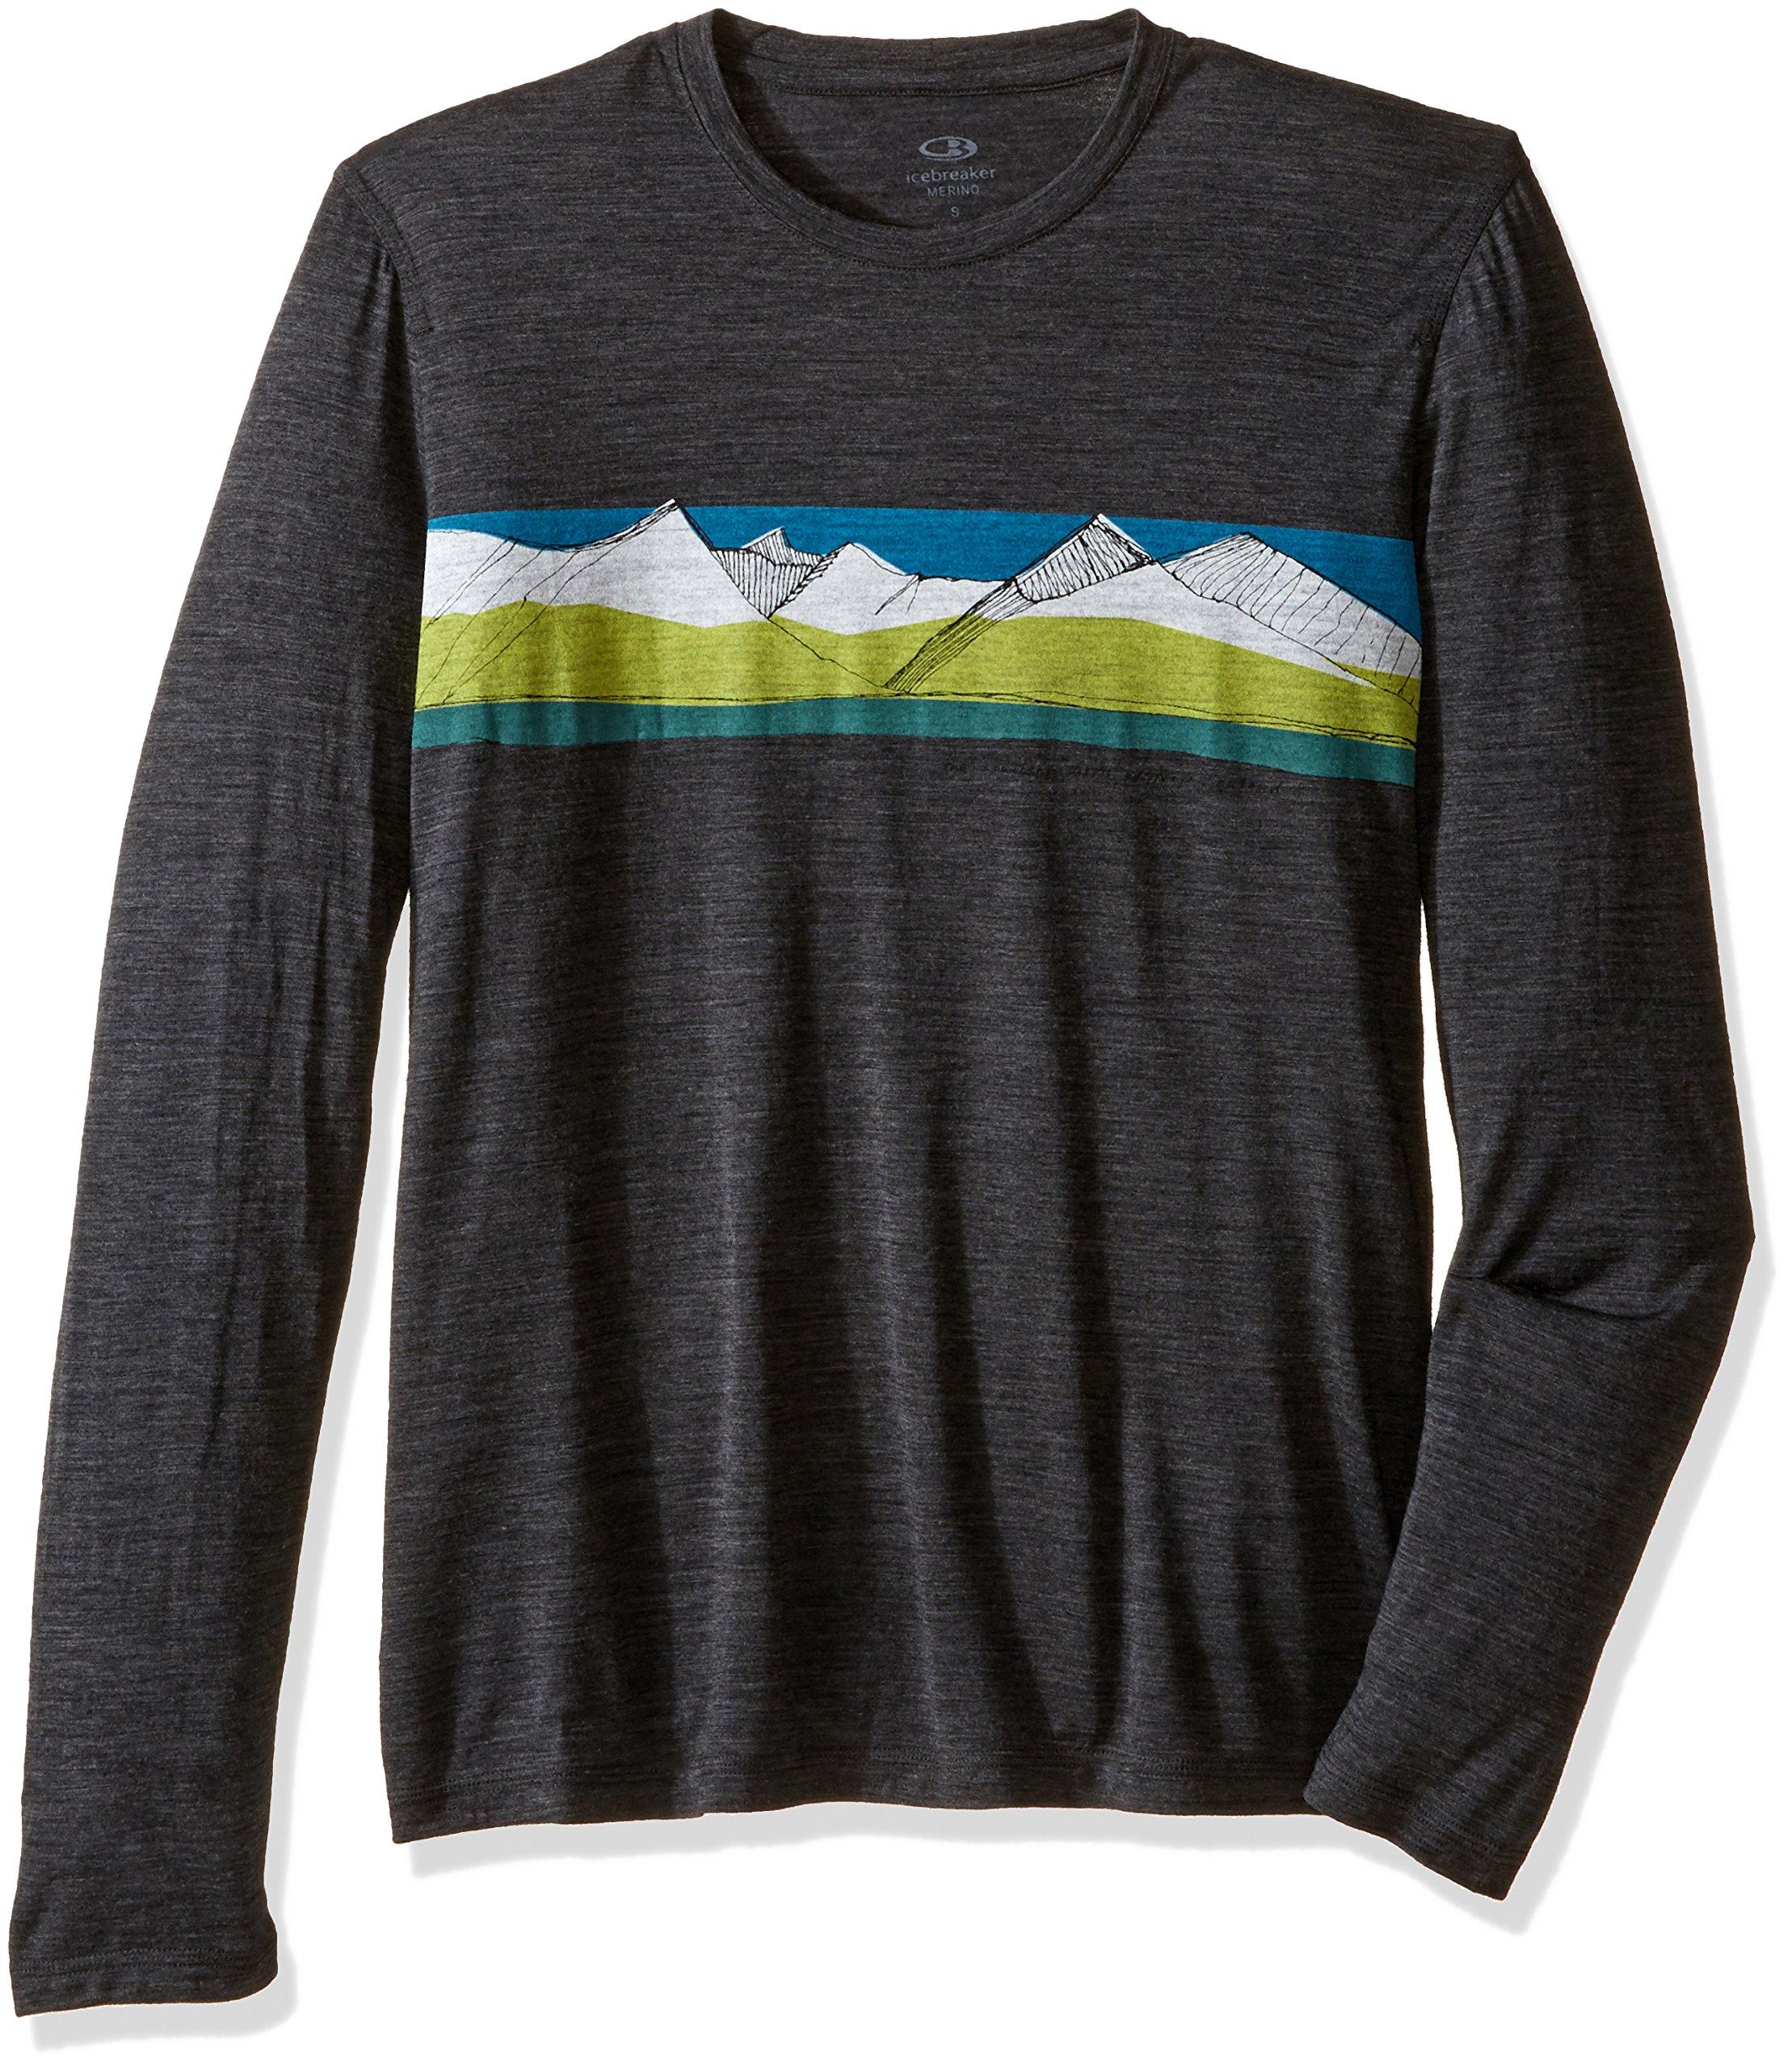 Icebreaker Merino Men's Tech Lite Long Sleeve South Alps Graphic Crewe T-Shirt, Jet Heather/Alpine, X-Large